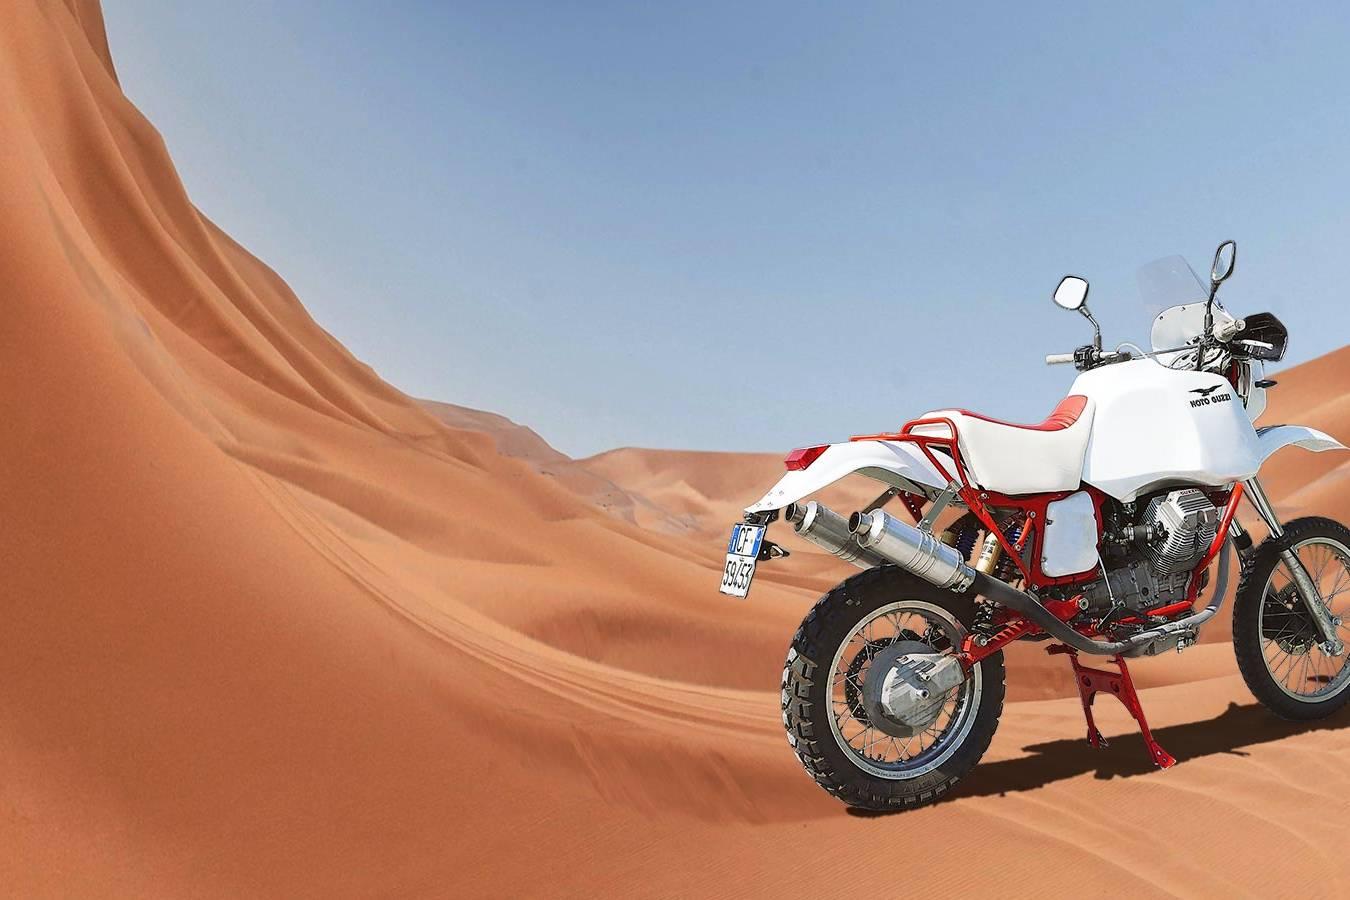 Joyside Moto Guzzi V75 Dakar replica